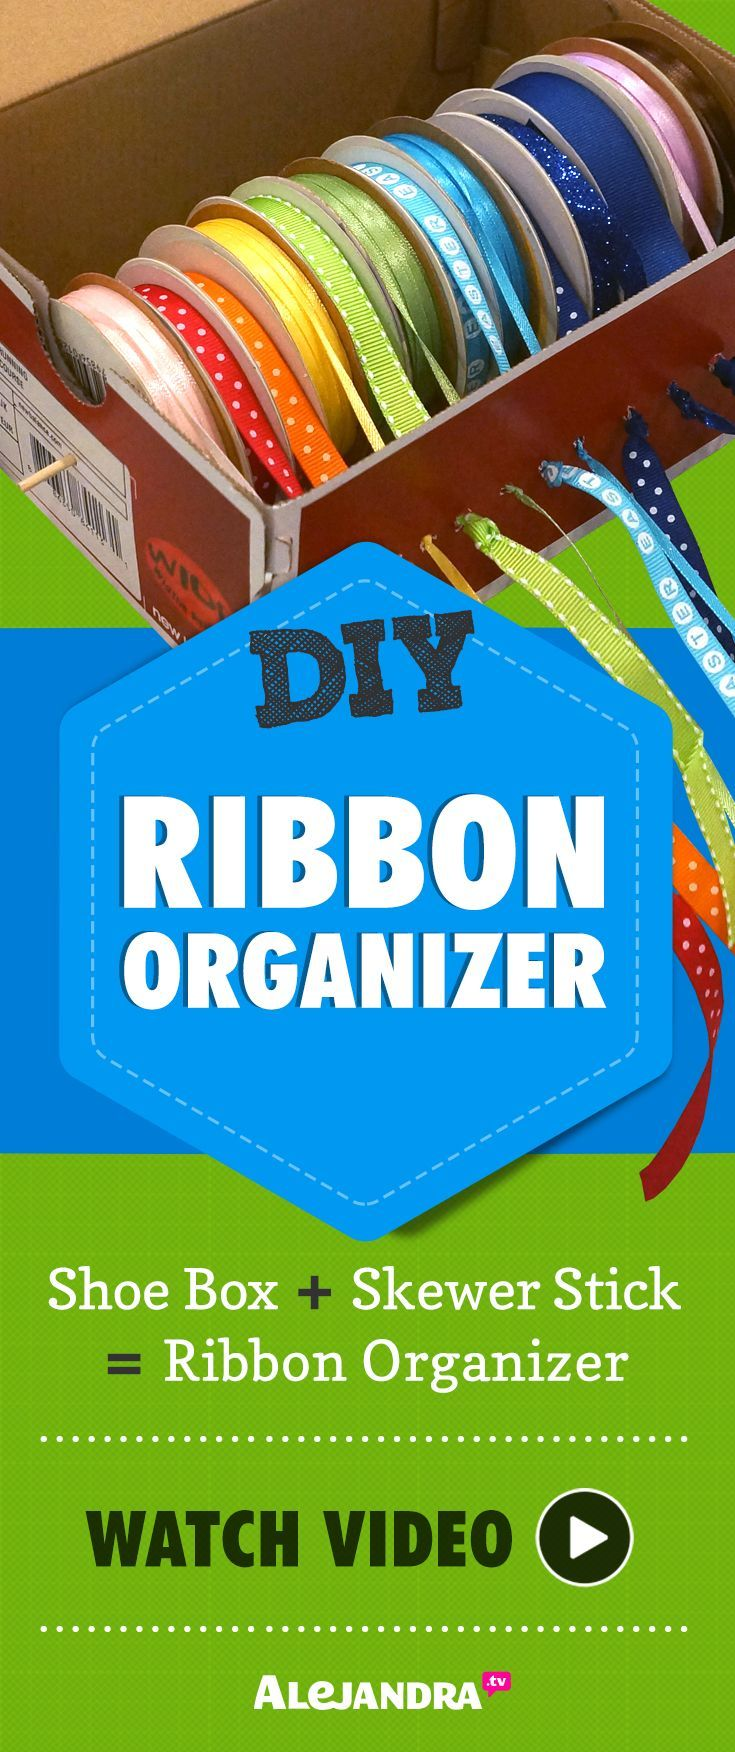 Craft supplies organization ideas - Diy Organization Ideas